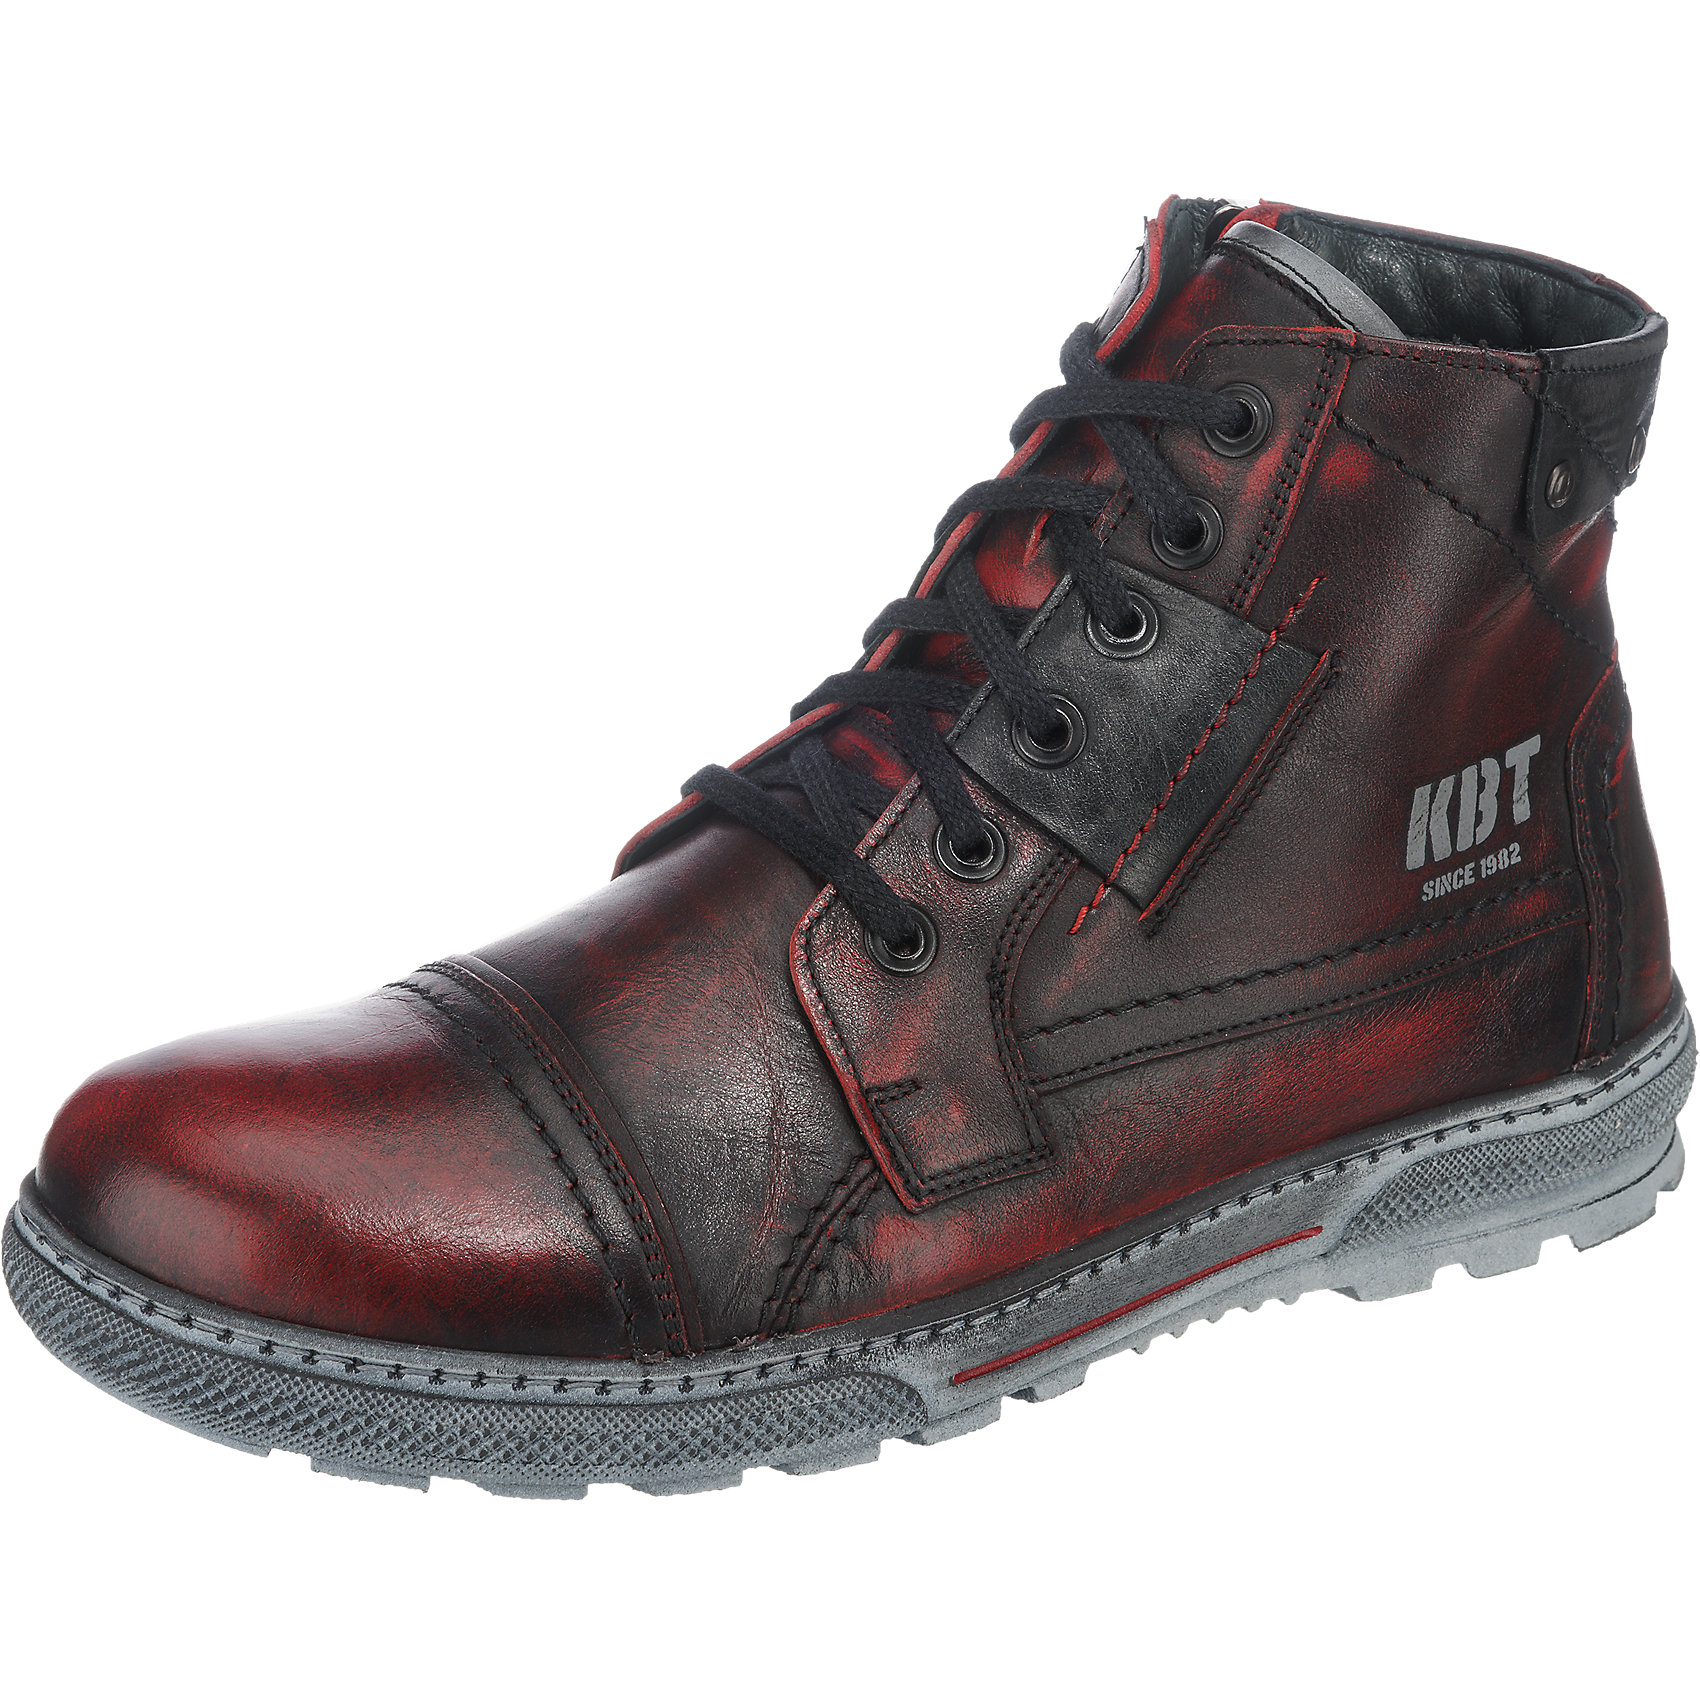 Billig hohe Qualität Neu Krisbut Stiefel rot 5760527